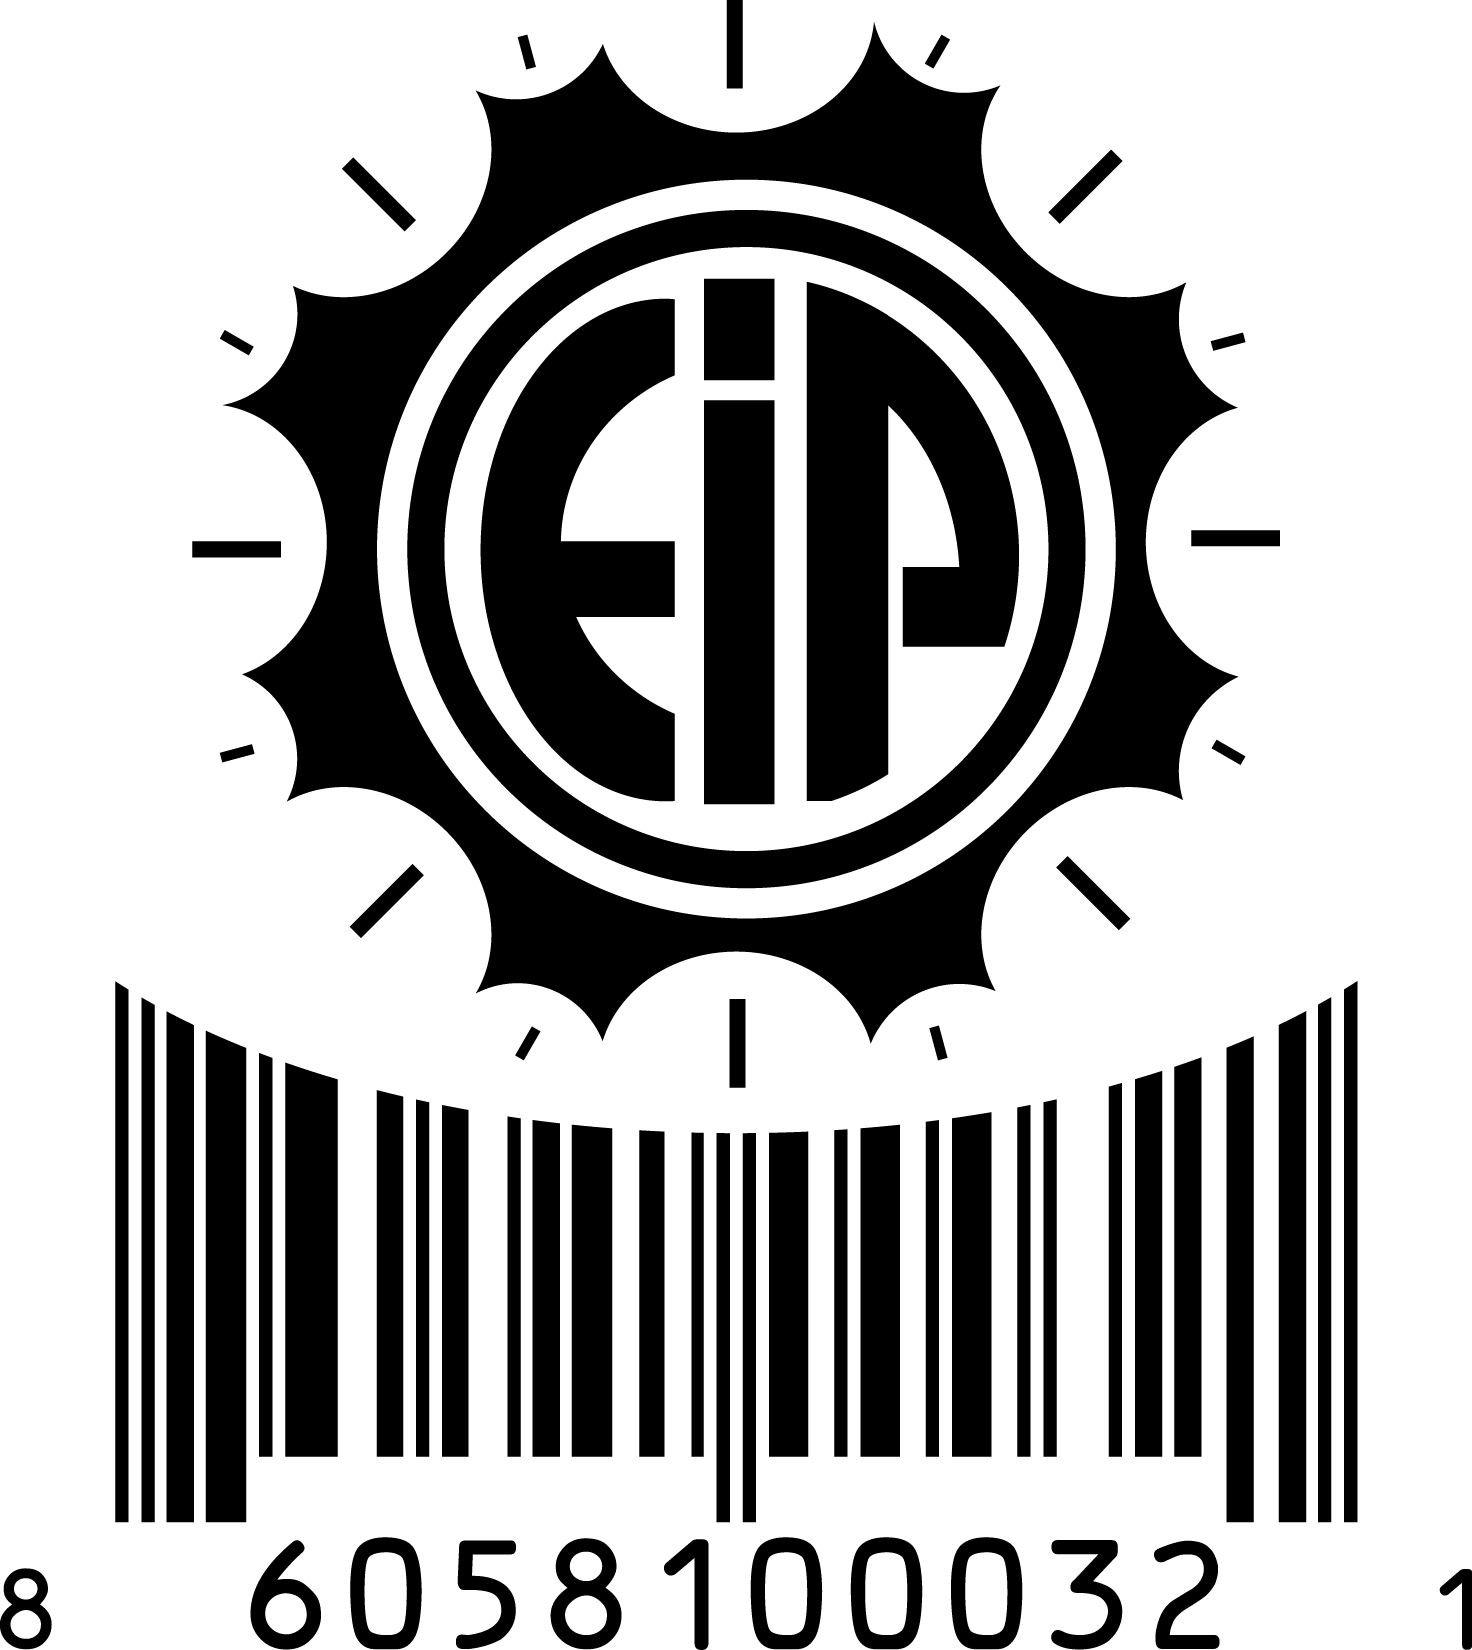 EIP Original Nikola Tesla Positive Energy Purple Disk